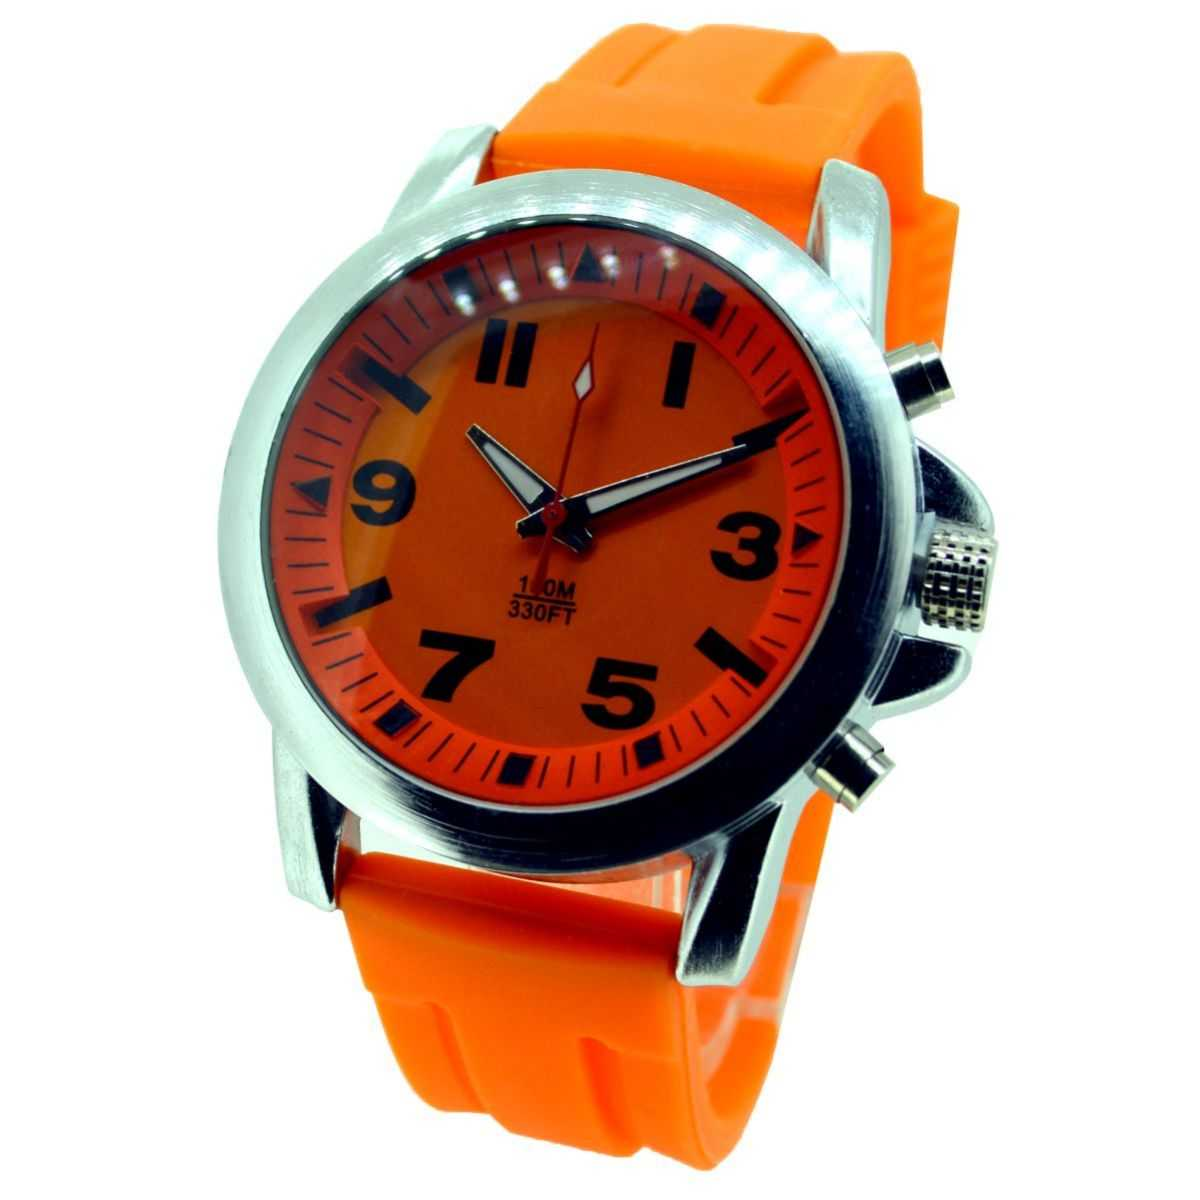 Relógio Personalizado 2463-6